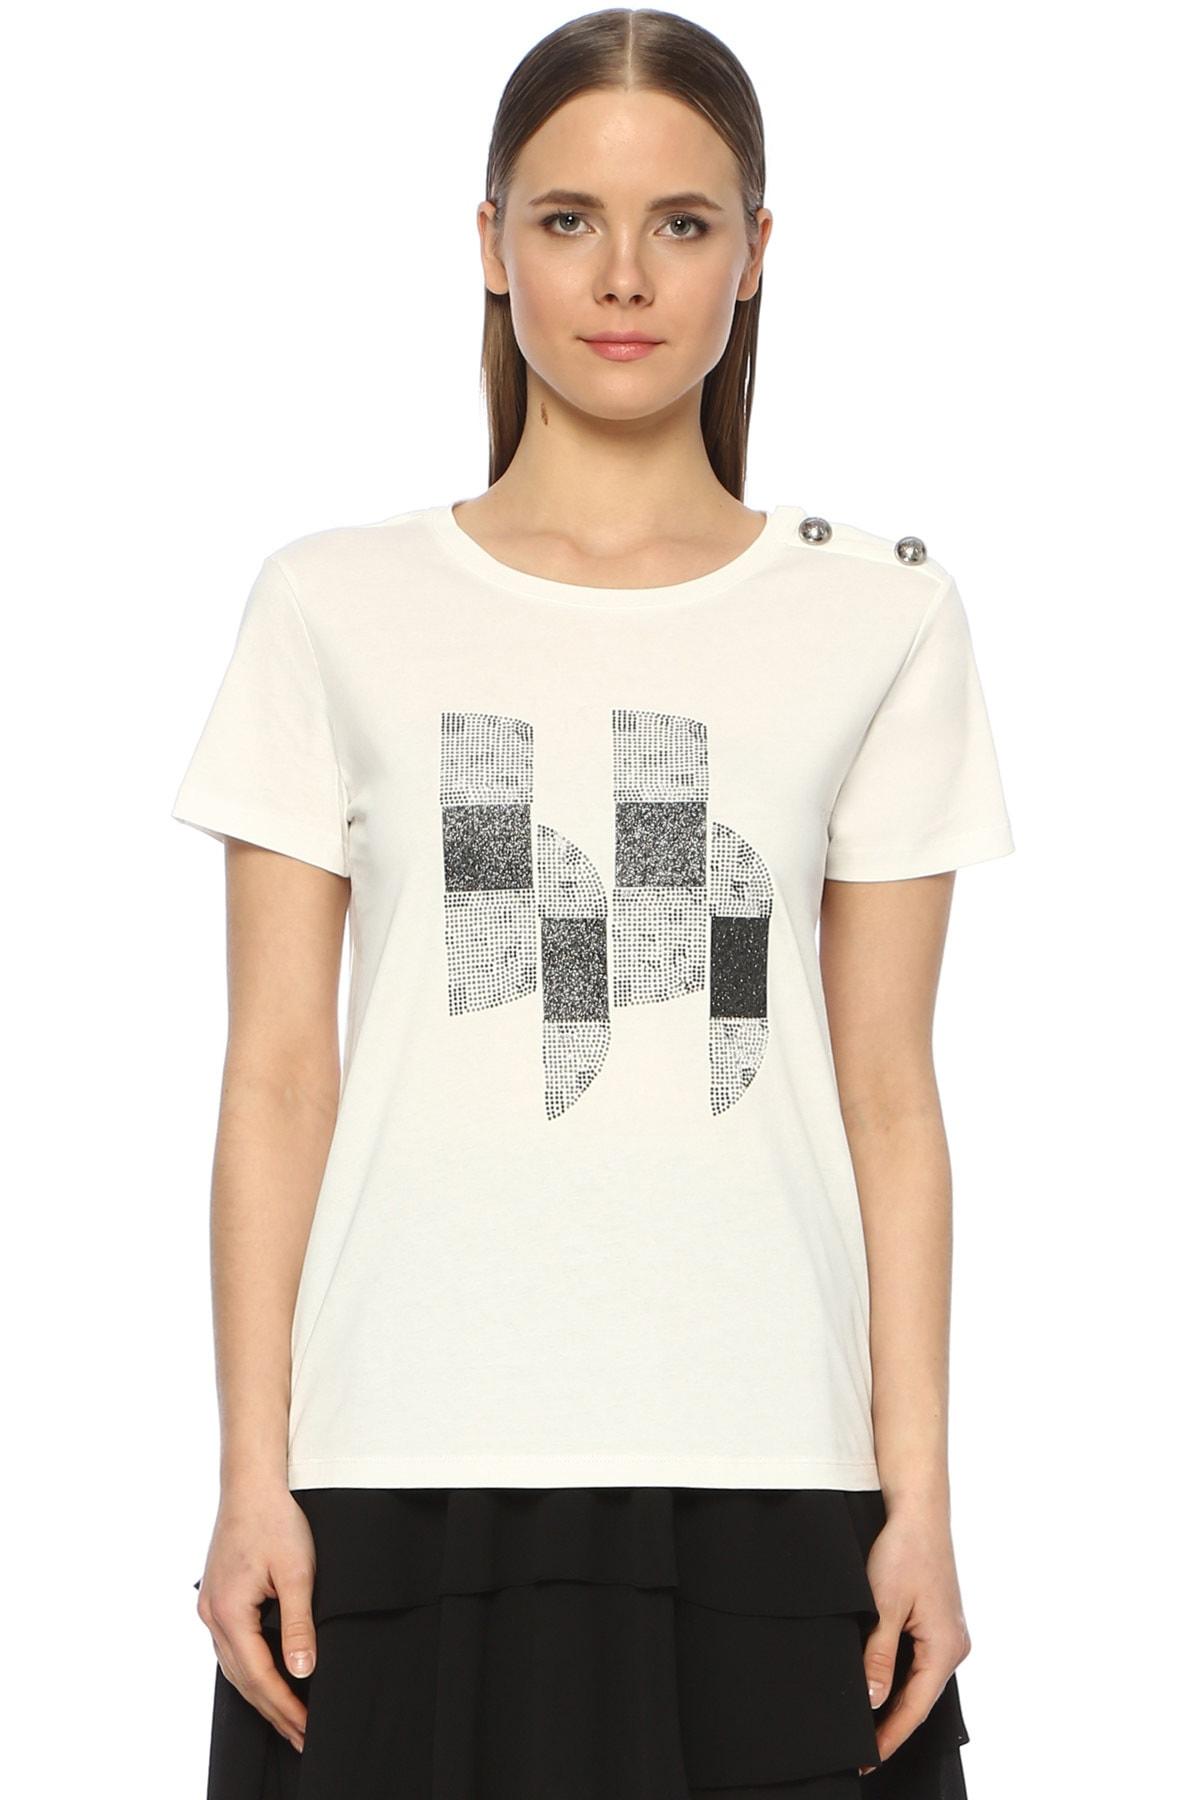 Network Kadın Bisiklet Yaka Beyaz Tshirt 1073302 1